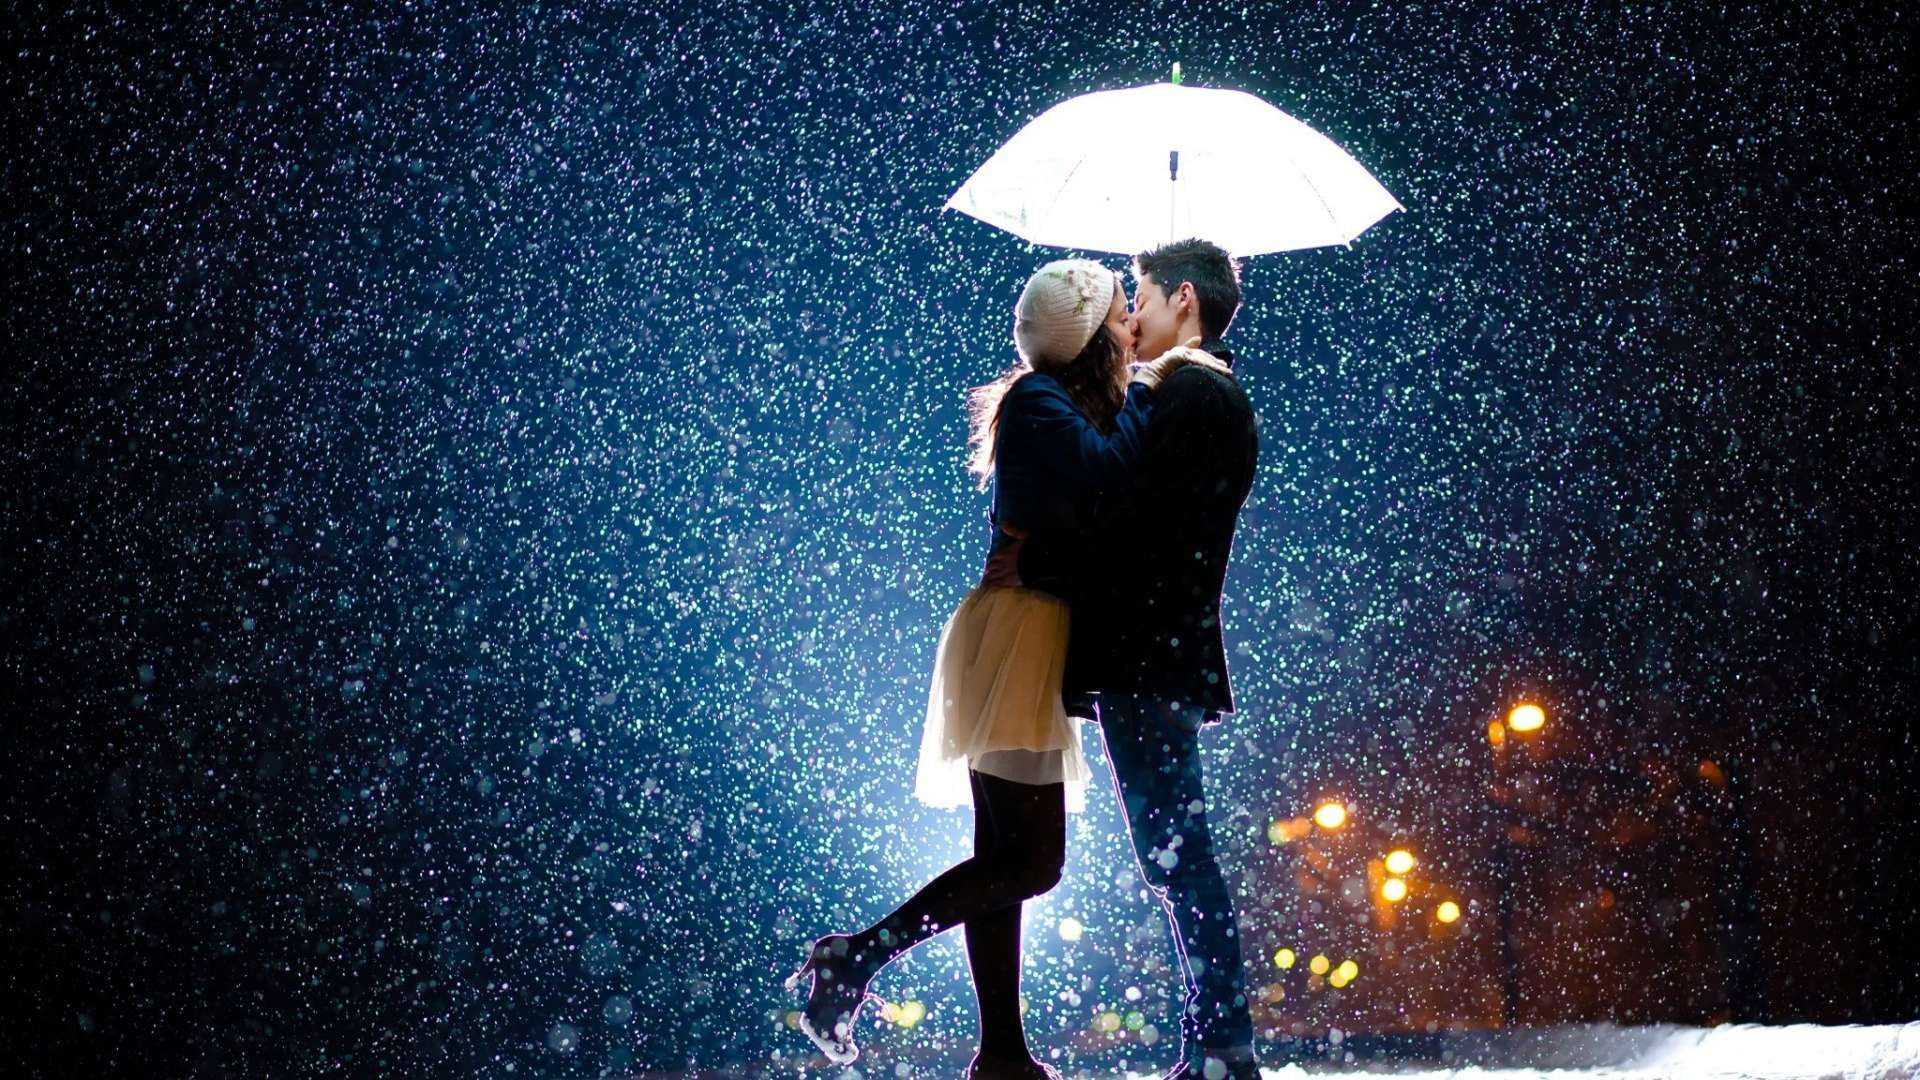 Hd wallpaper upload - Wallpaper Love Kiss Umbrella Hd Wallpaper 1080p Upload At September